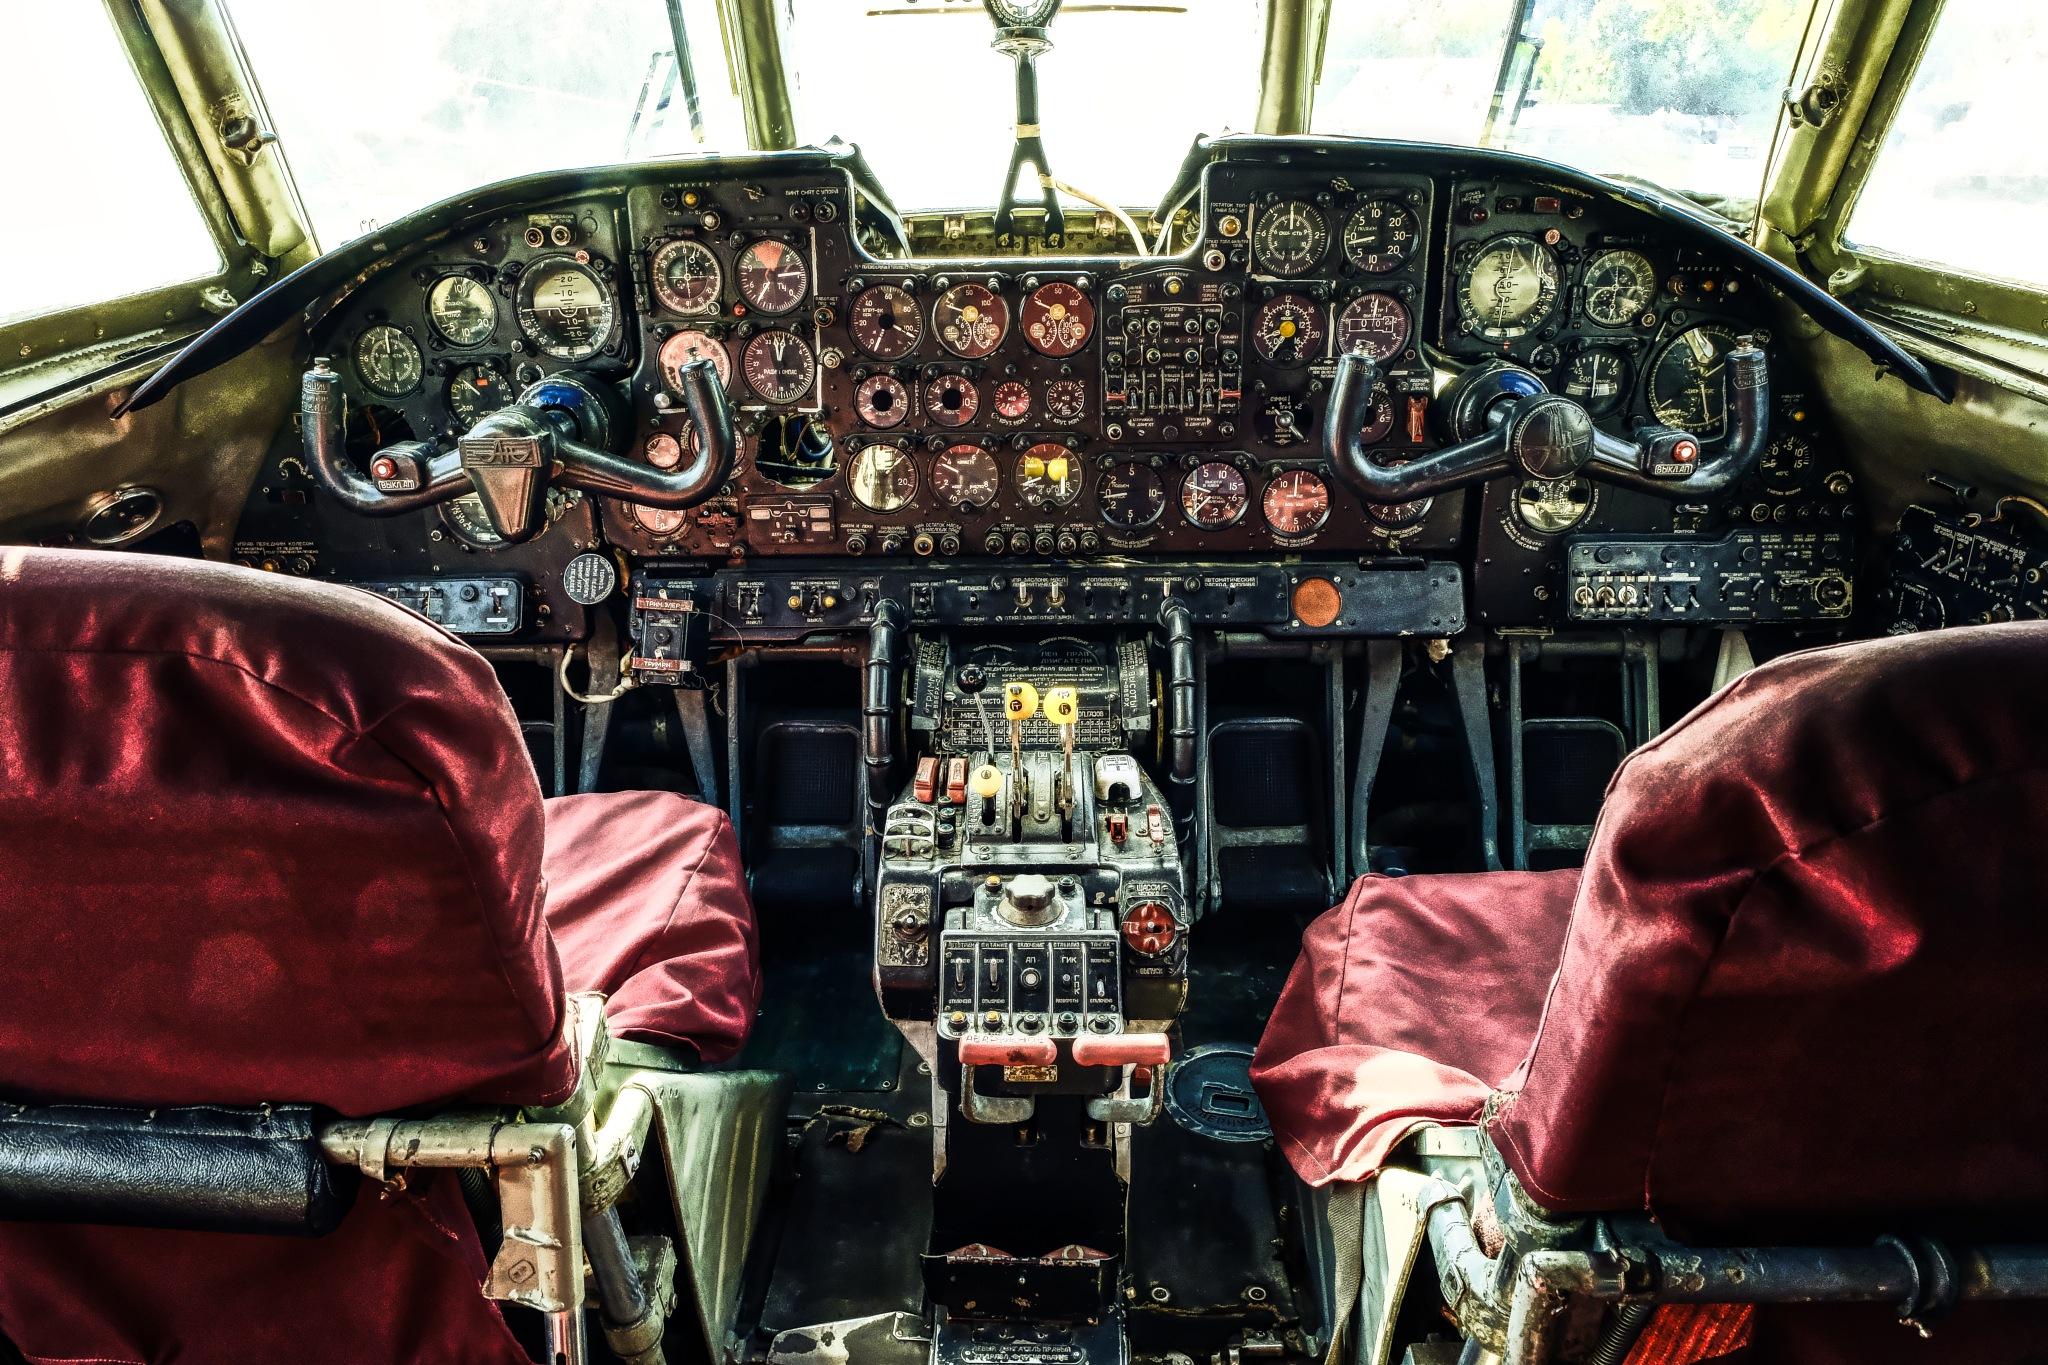 In cockpit of old Russian war plane  by Goran Jorganovich